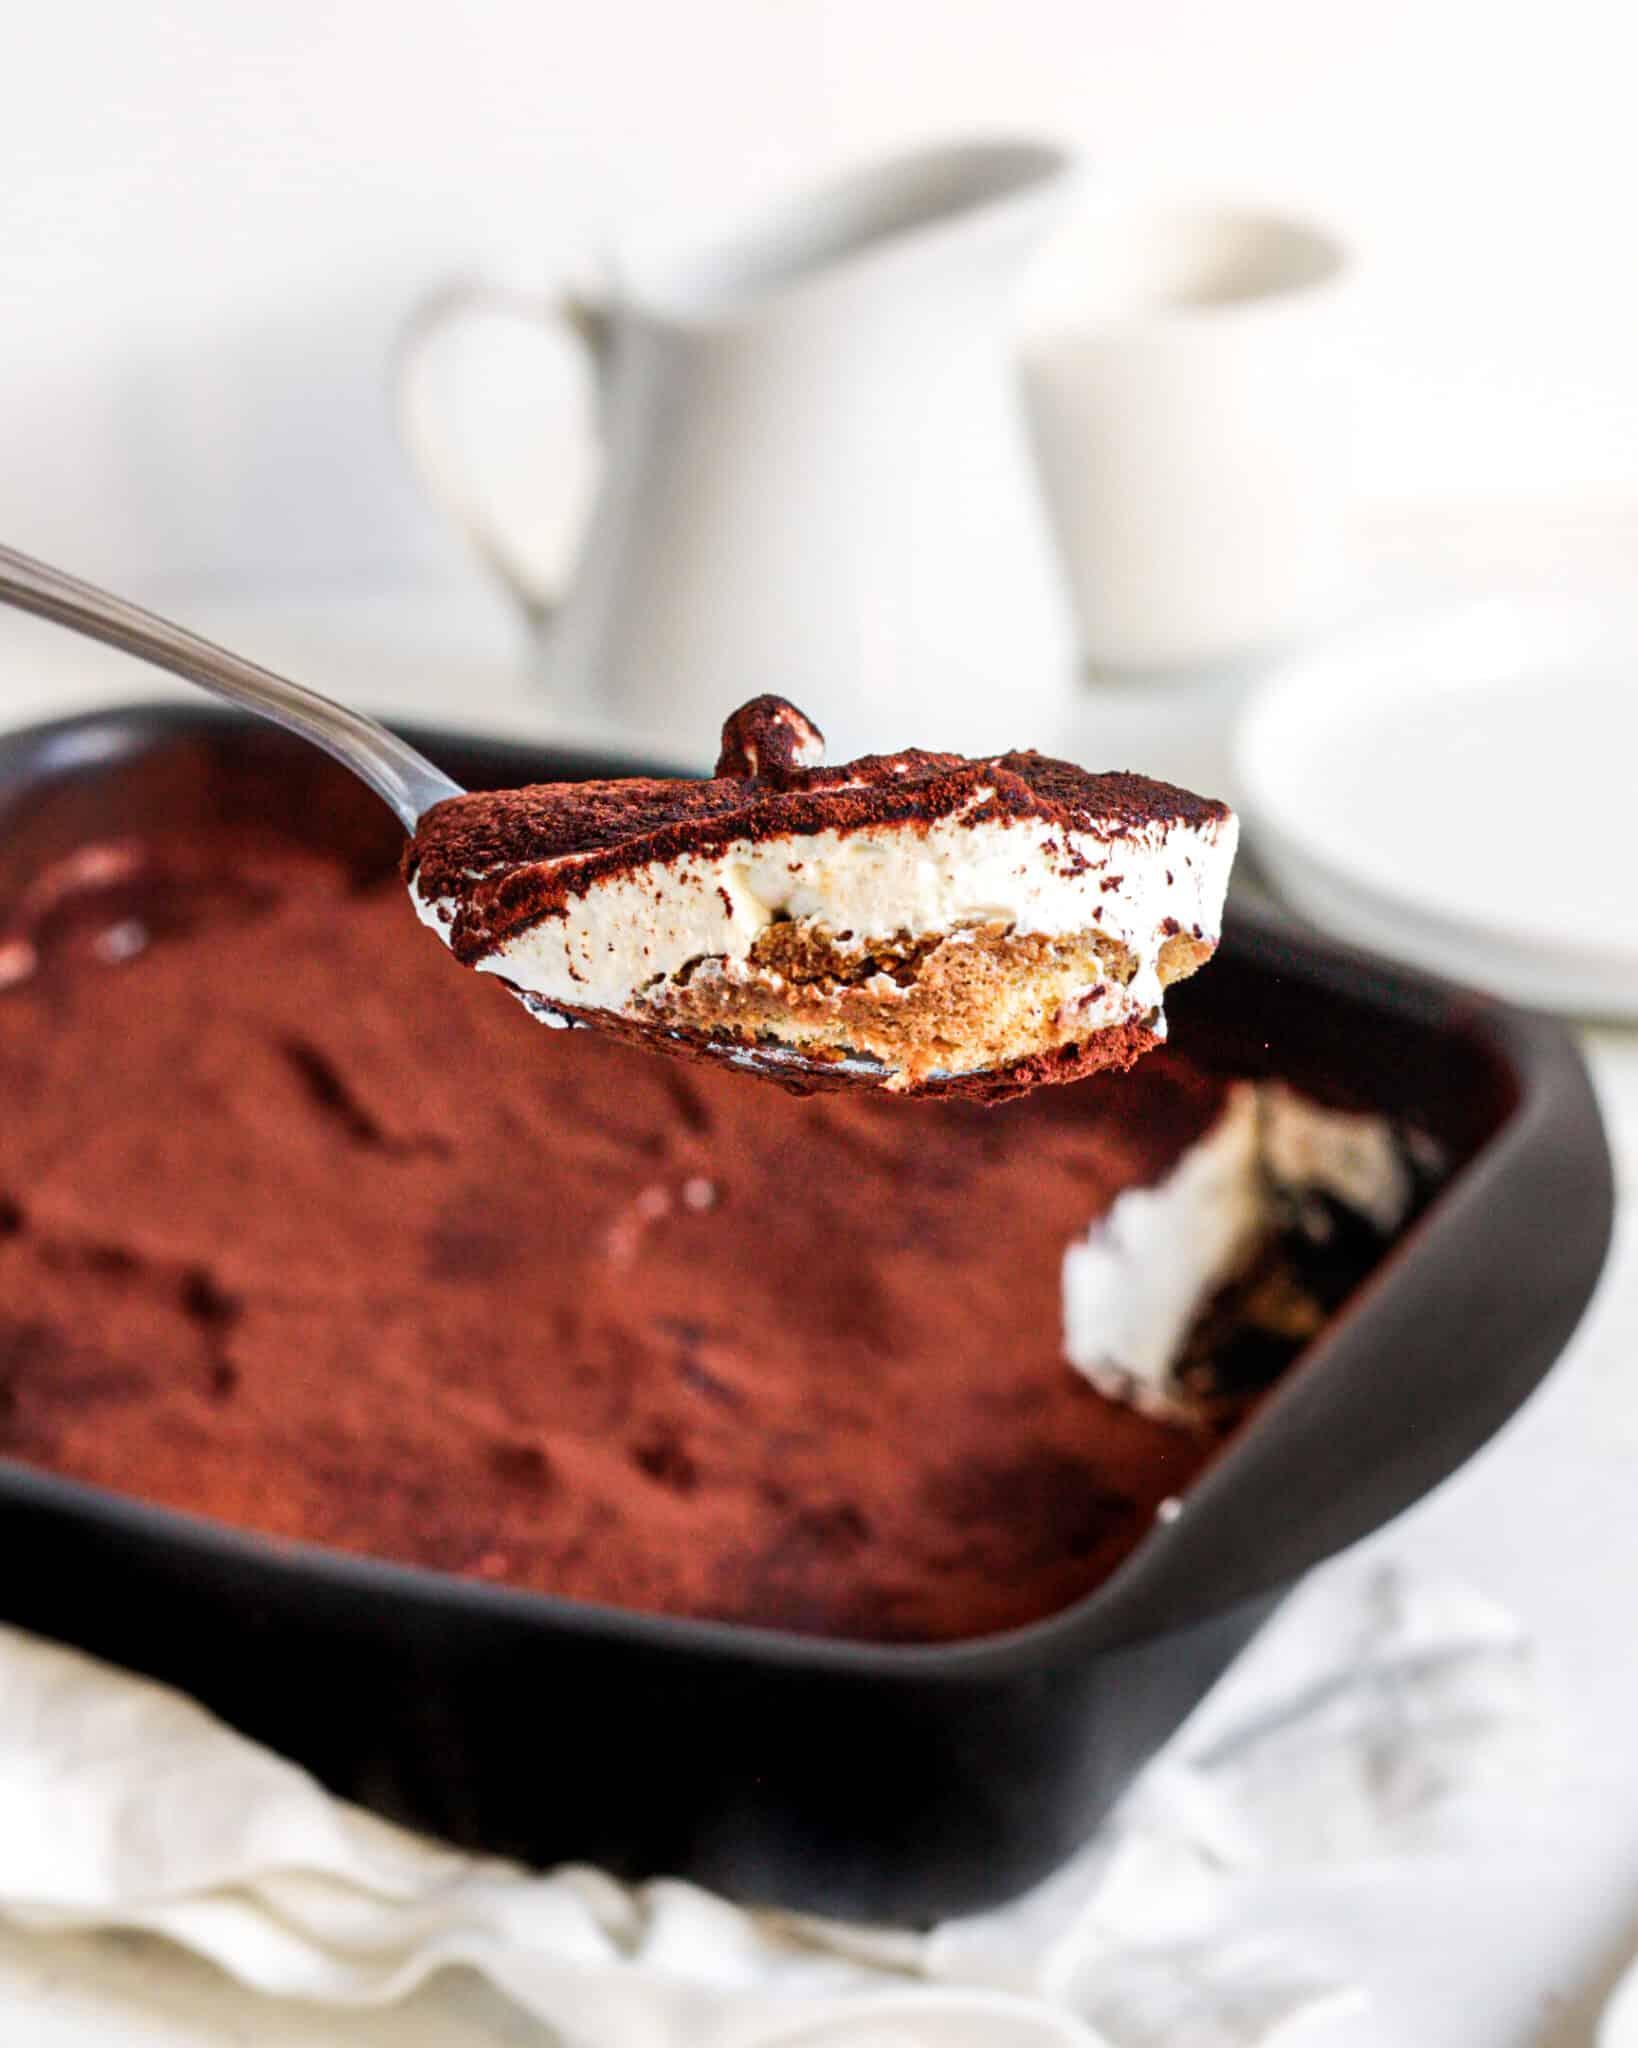 Recette tiramisu maison facile et inratable au cake factory tefal